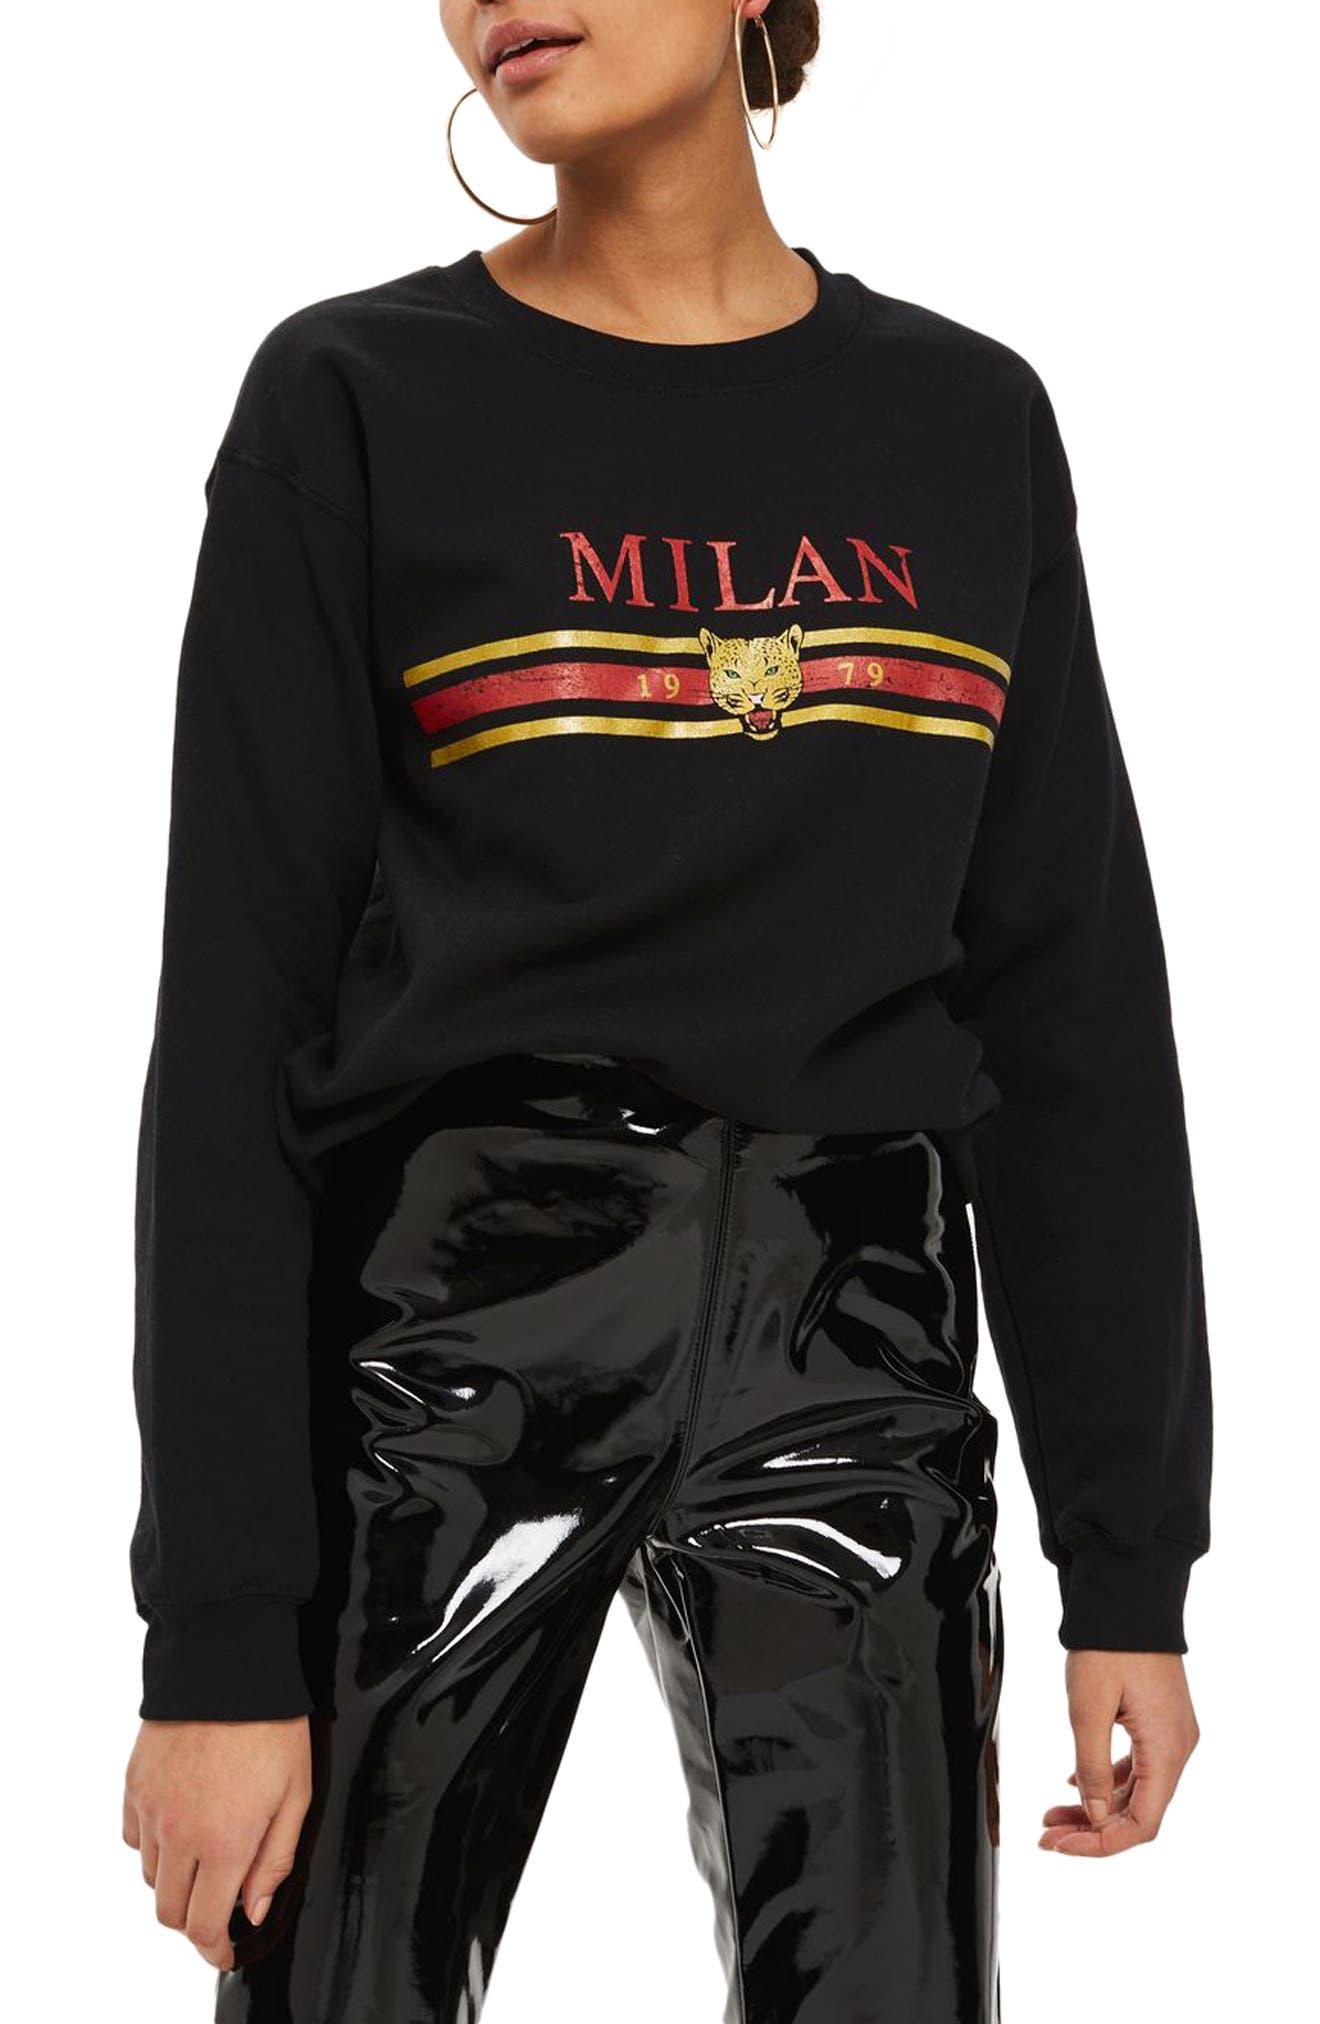 Milan Graphic Sweatshirt,                             Main thumbnail 1, color,                             Black Multi